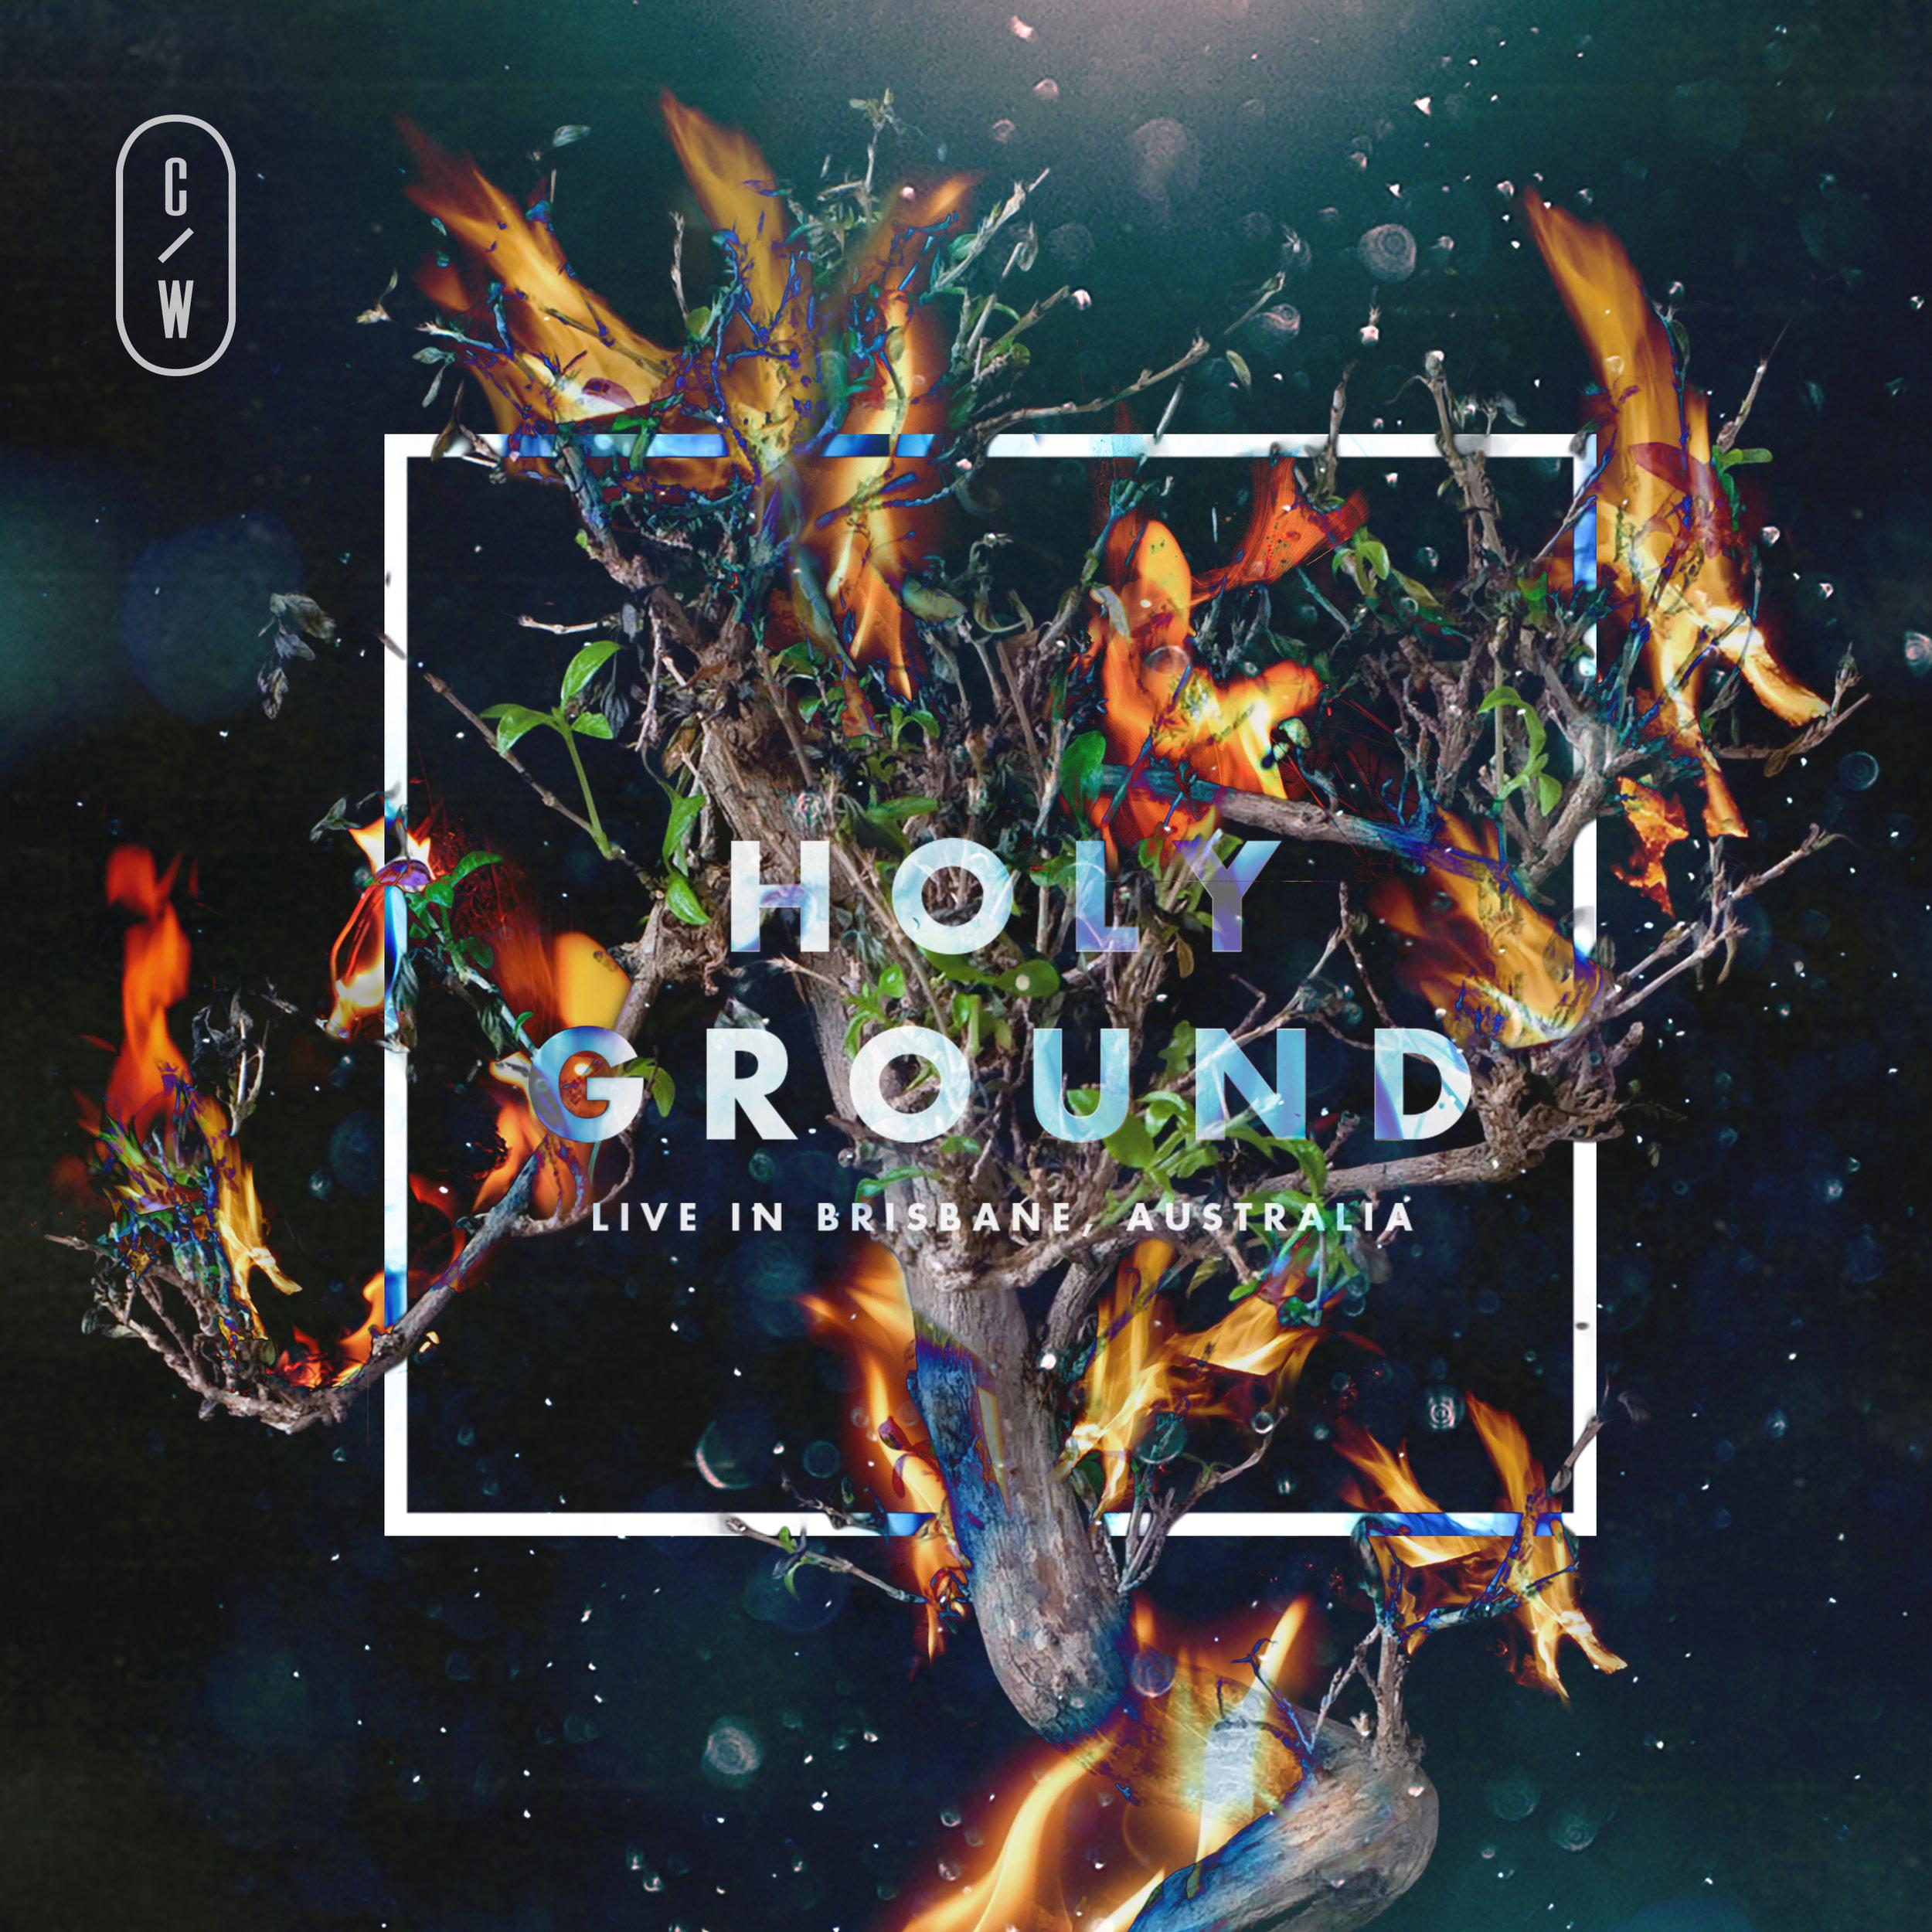 CW-HolyGround-3000px.jpg